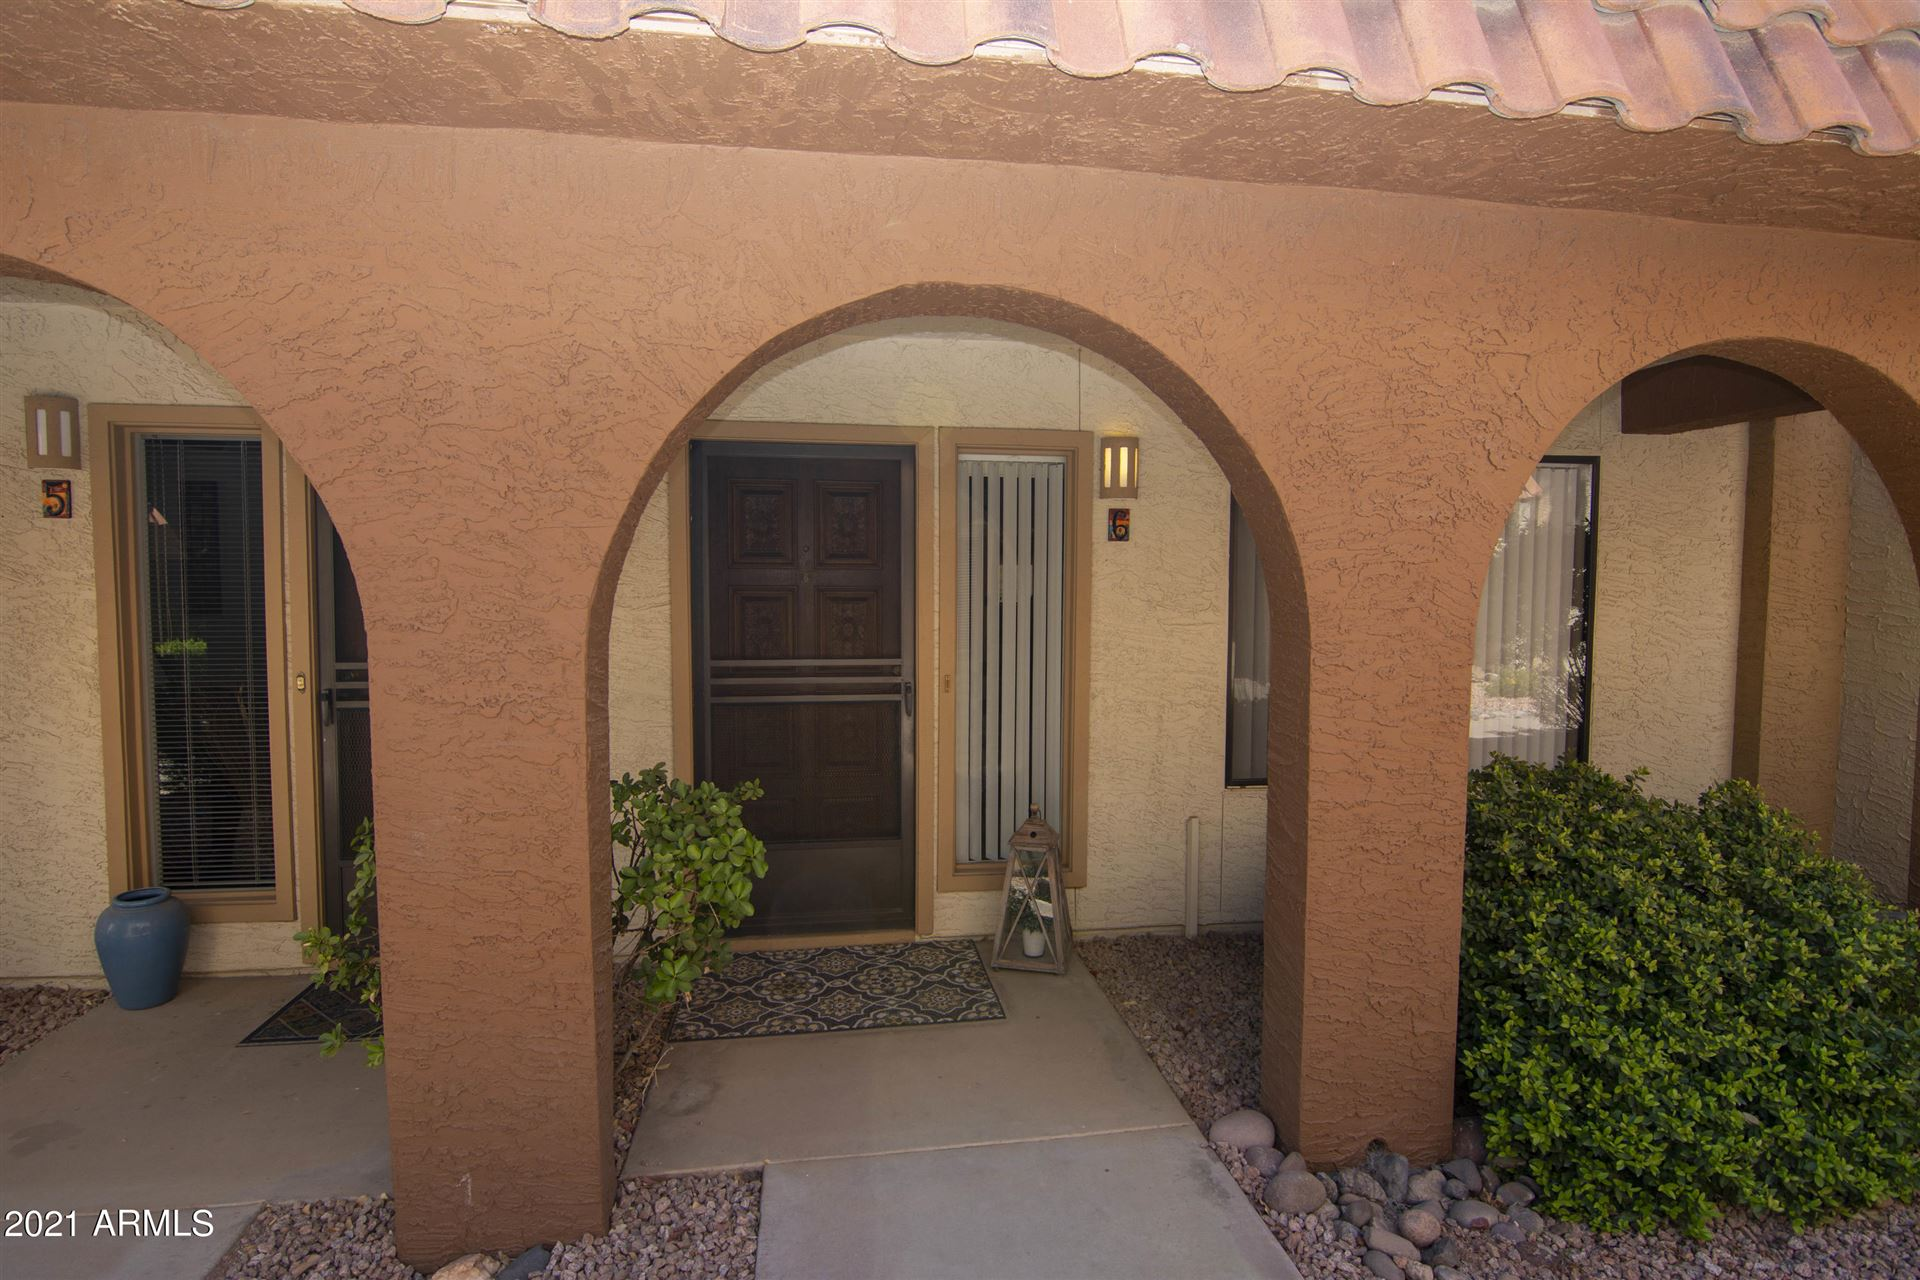 Photo of 16510 E PALISADES Boulevard E #6, Fountain Hills, AZ 85268 (MLS # 6231391)